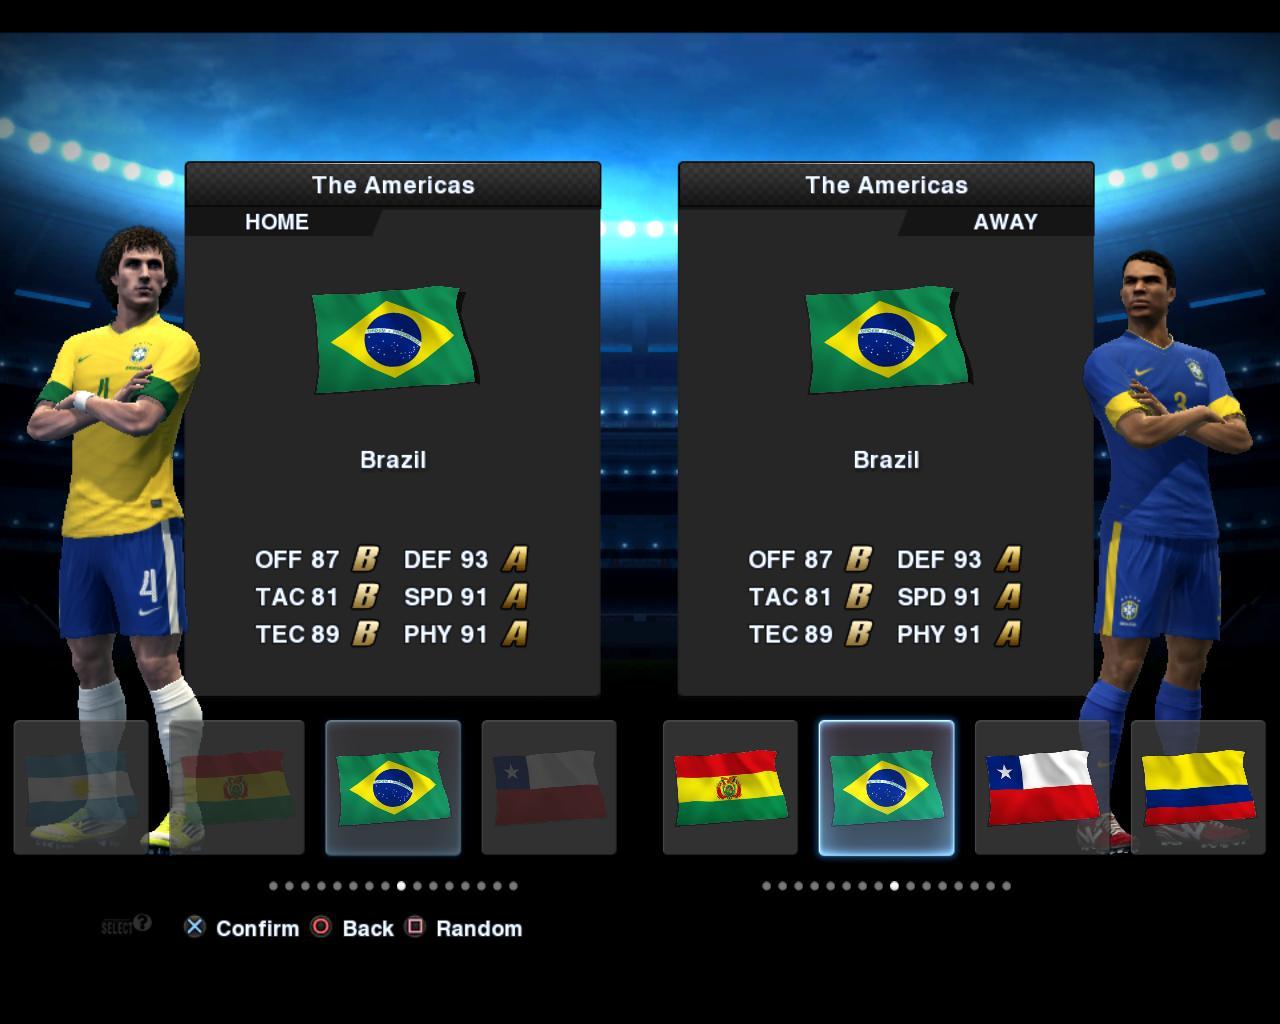 Brasil 2012/13 Kitset - PES 2013